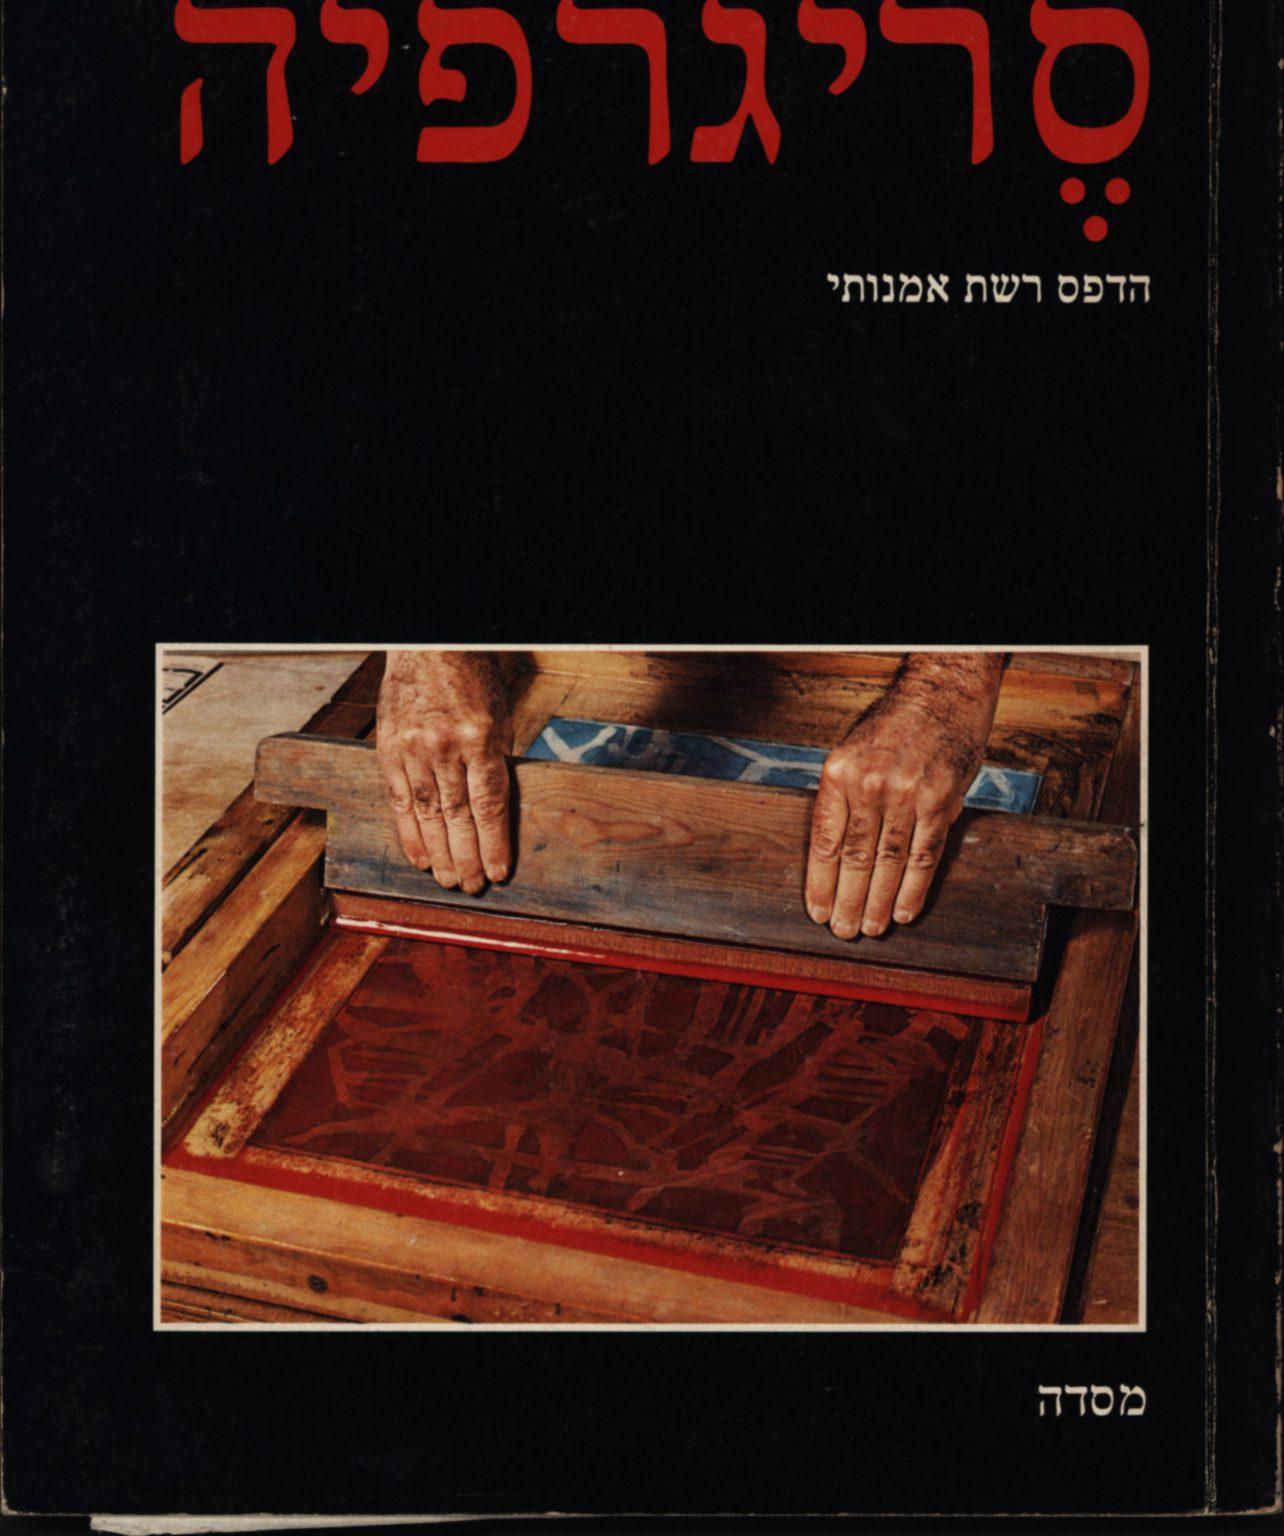 Shlomo Vitkin, Serigraphy, Masada, 1980